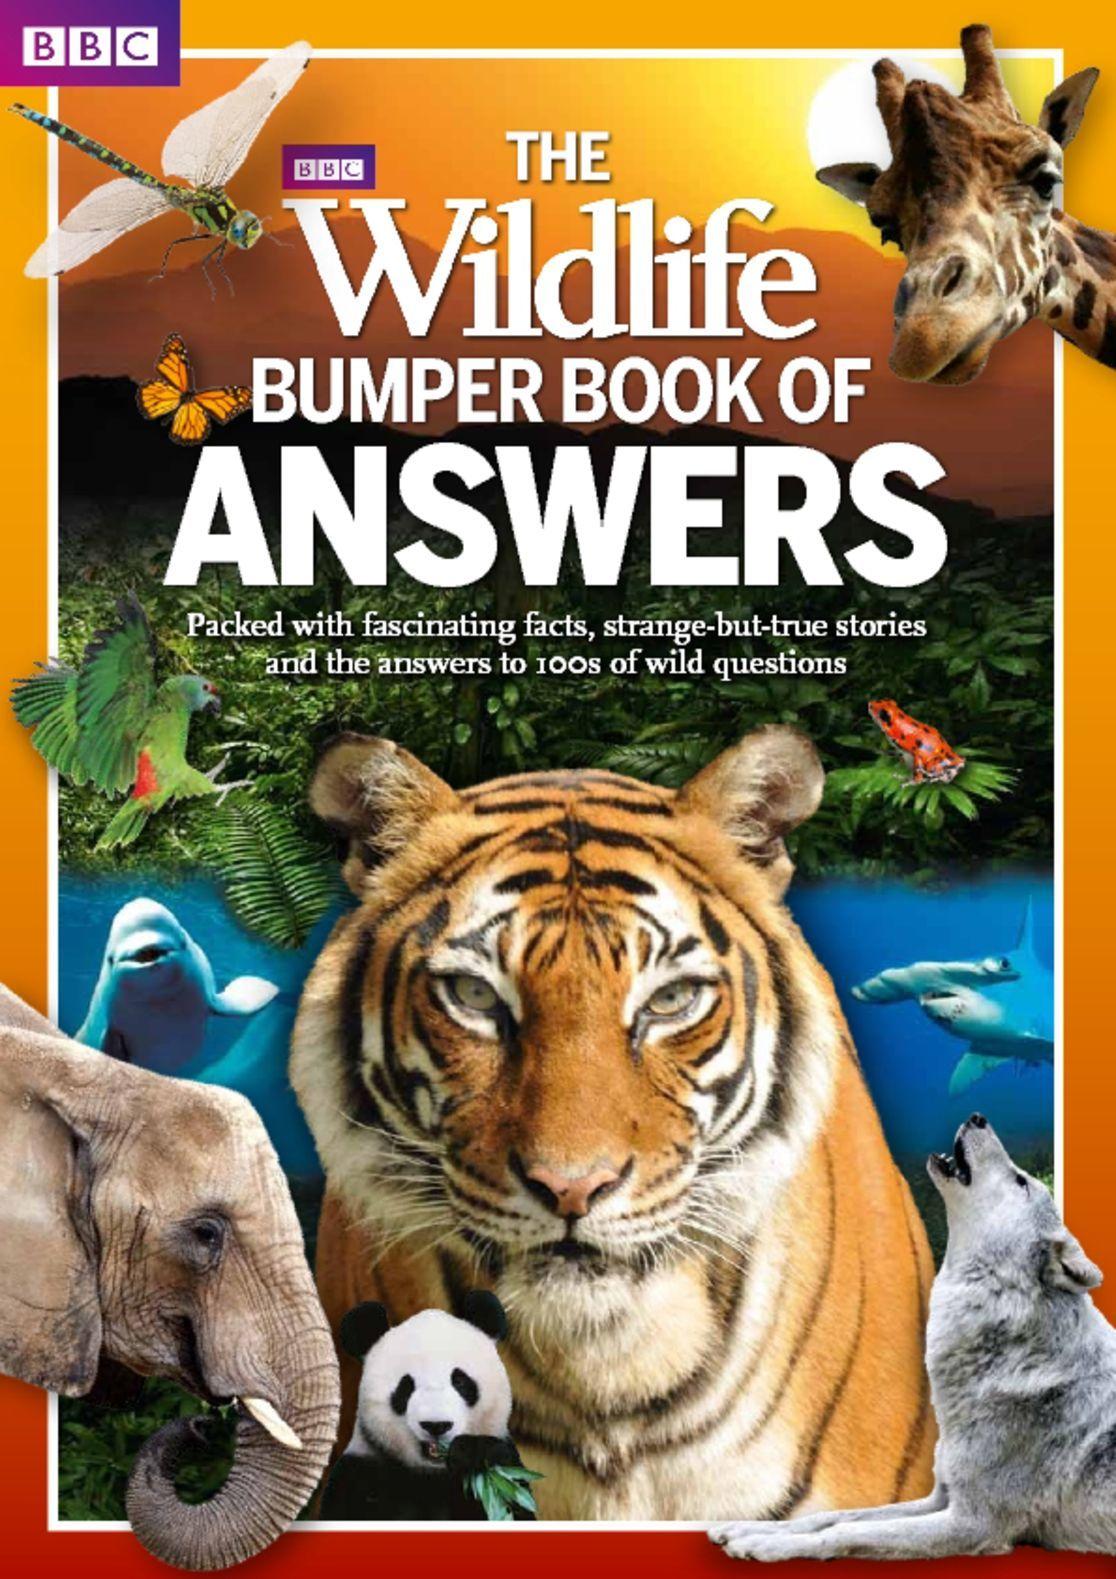 BBC Wildlife Bumper Book of Answers Digital